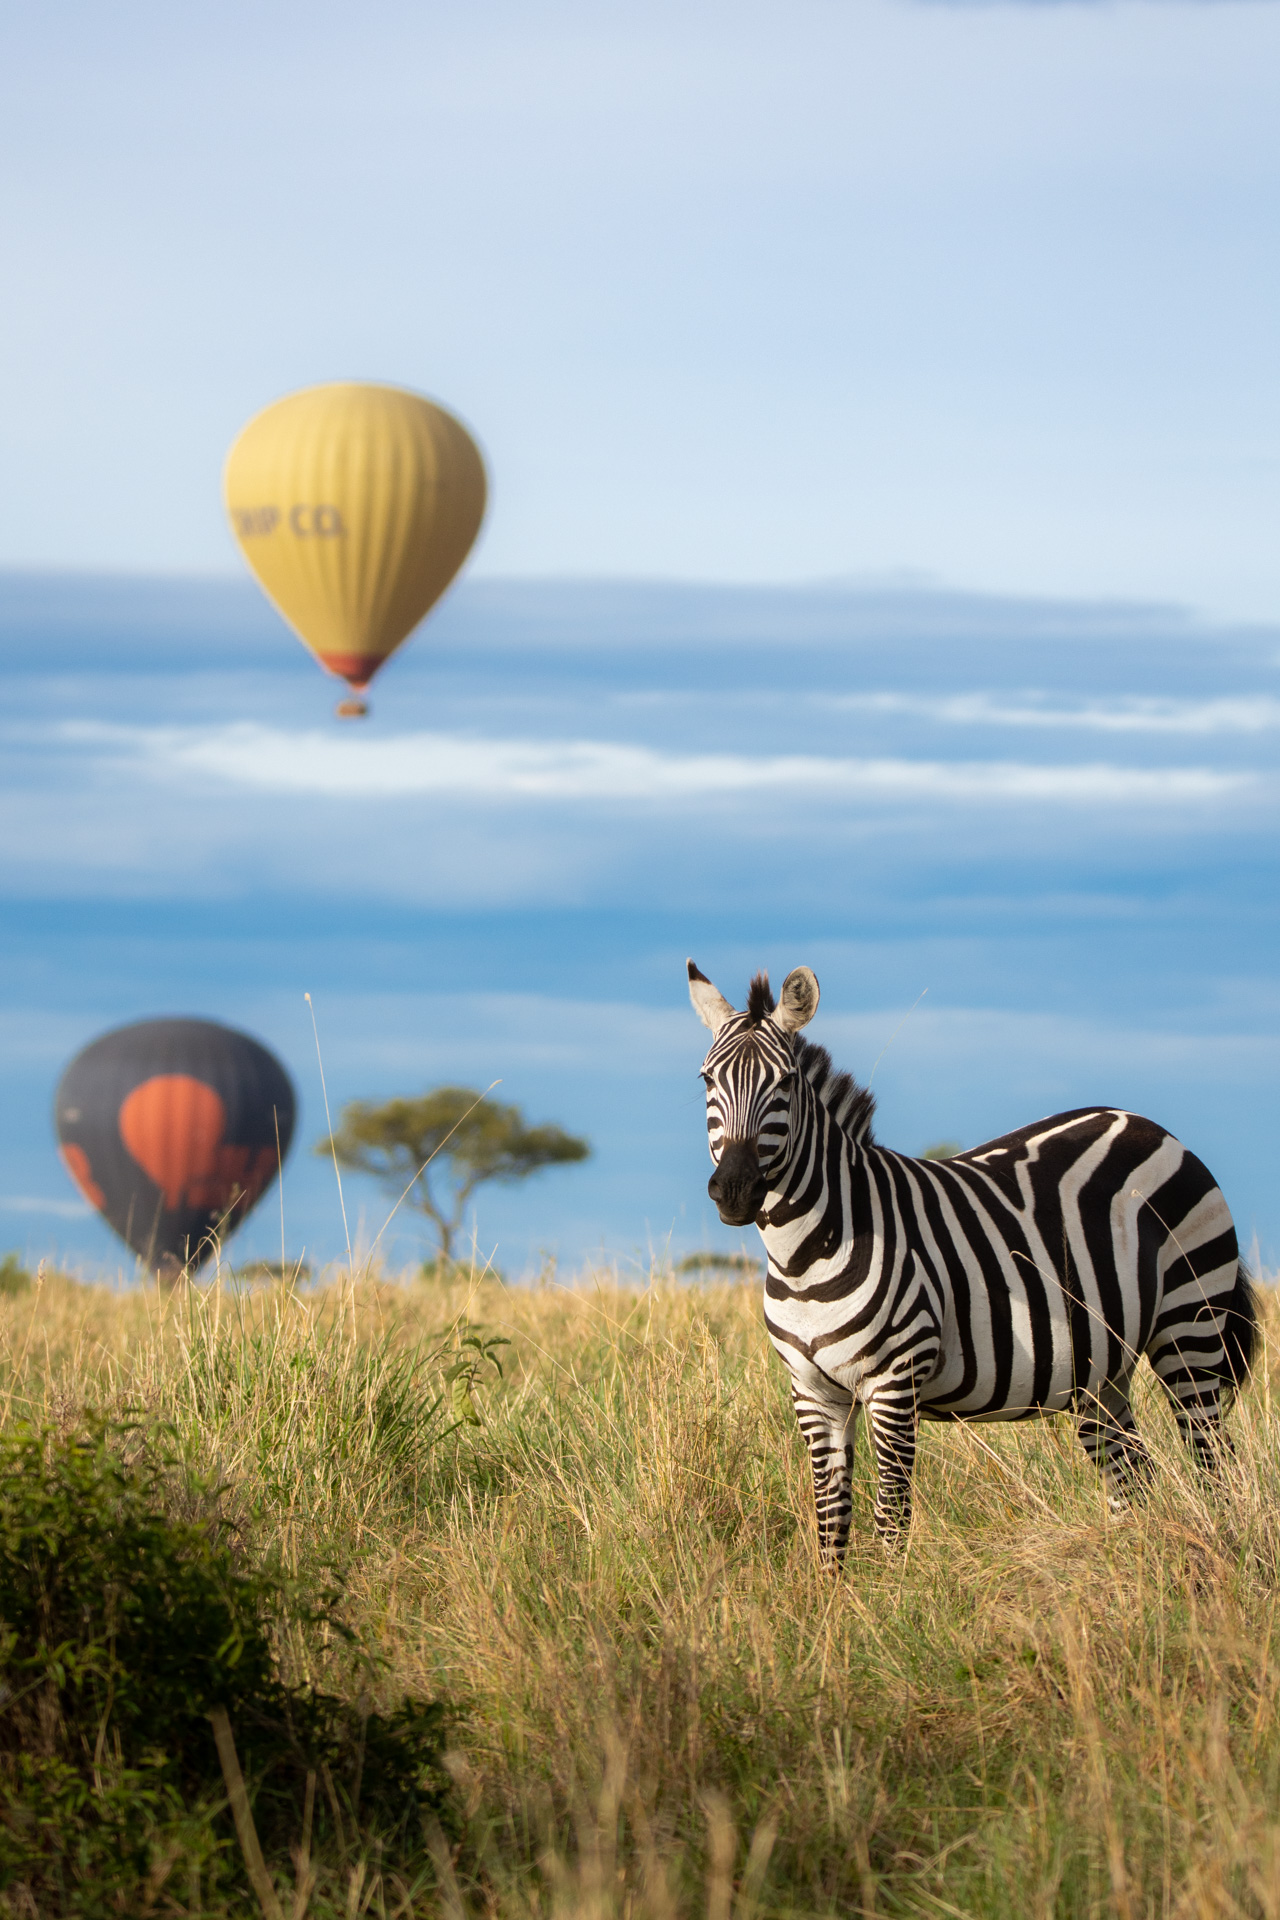 Zebra and balloon 2